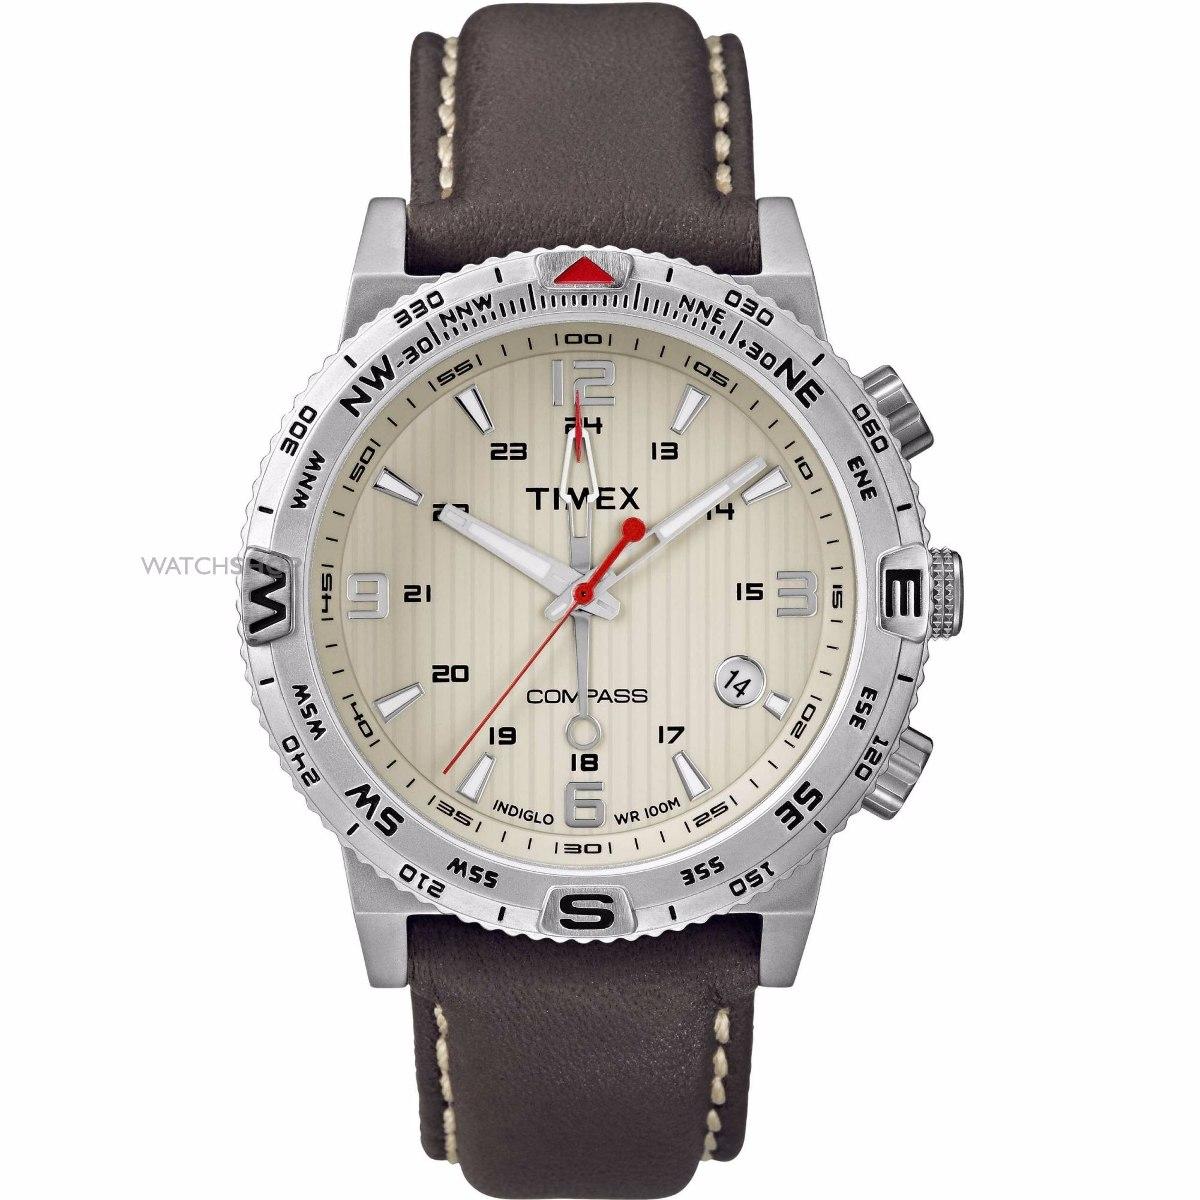 6c8069faced9 Reloj Timex Compass -   7.490